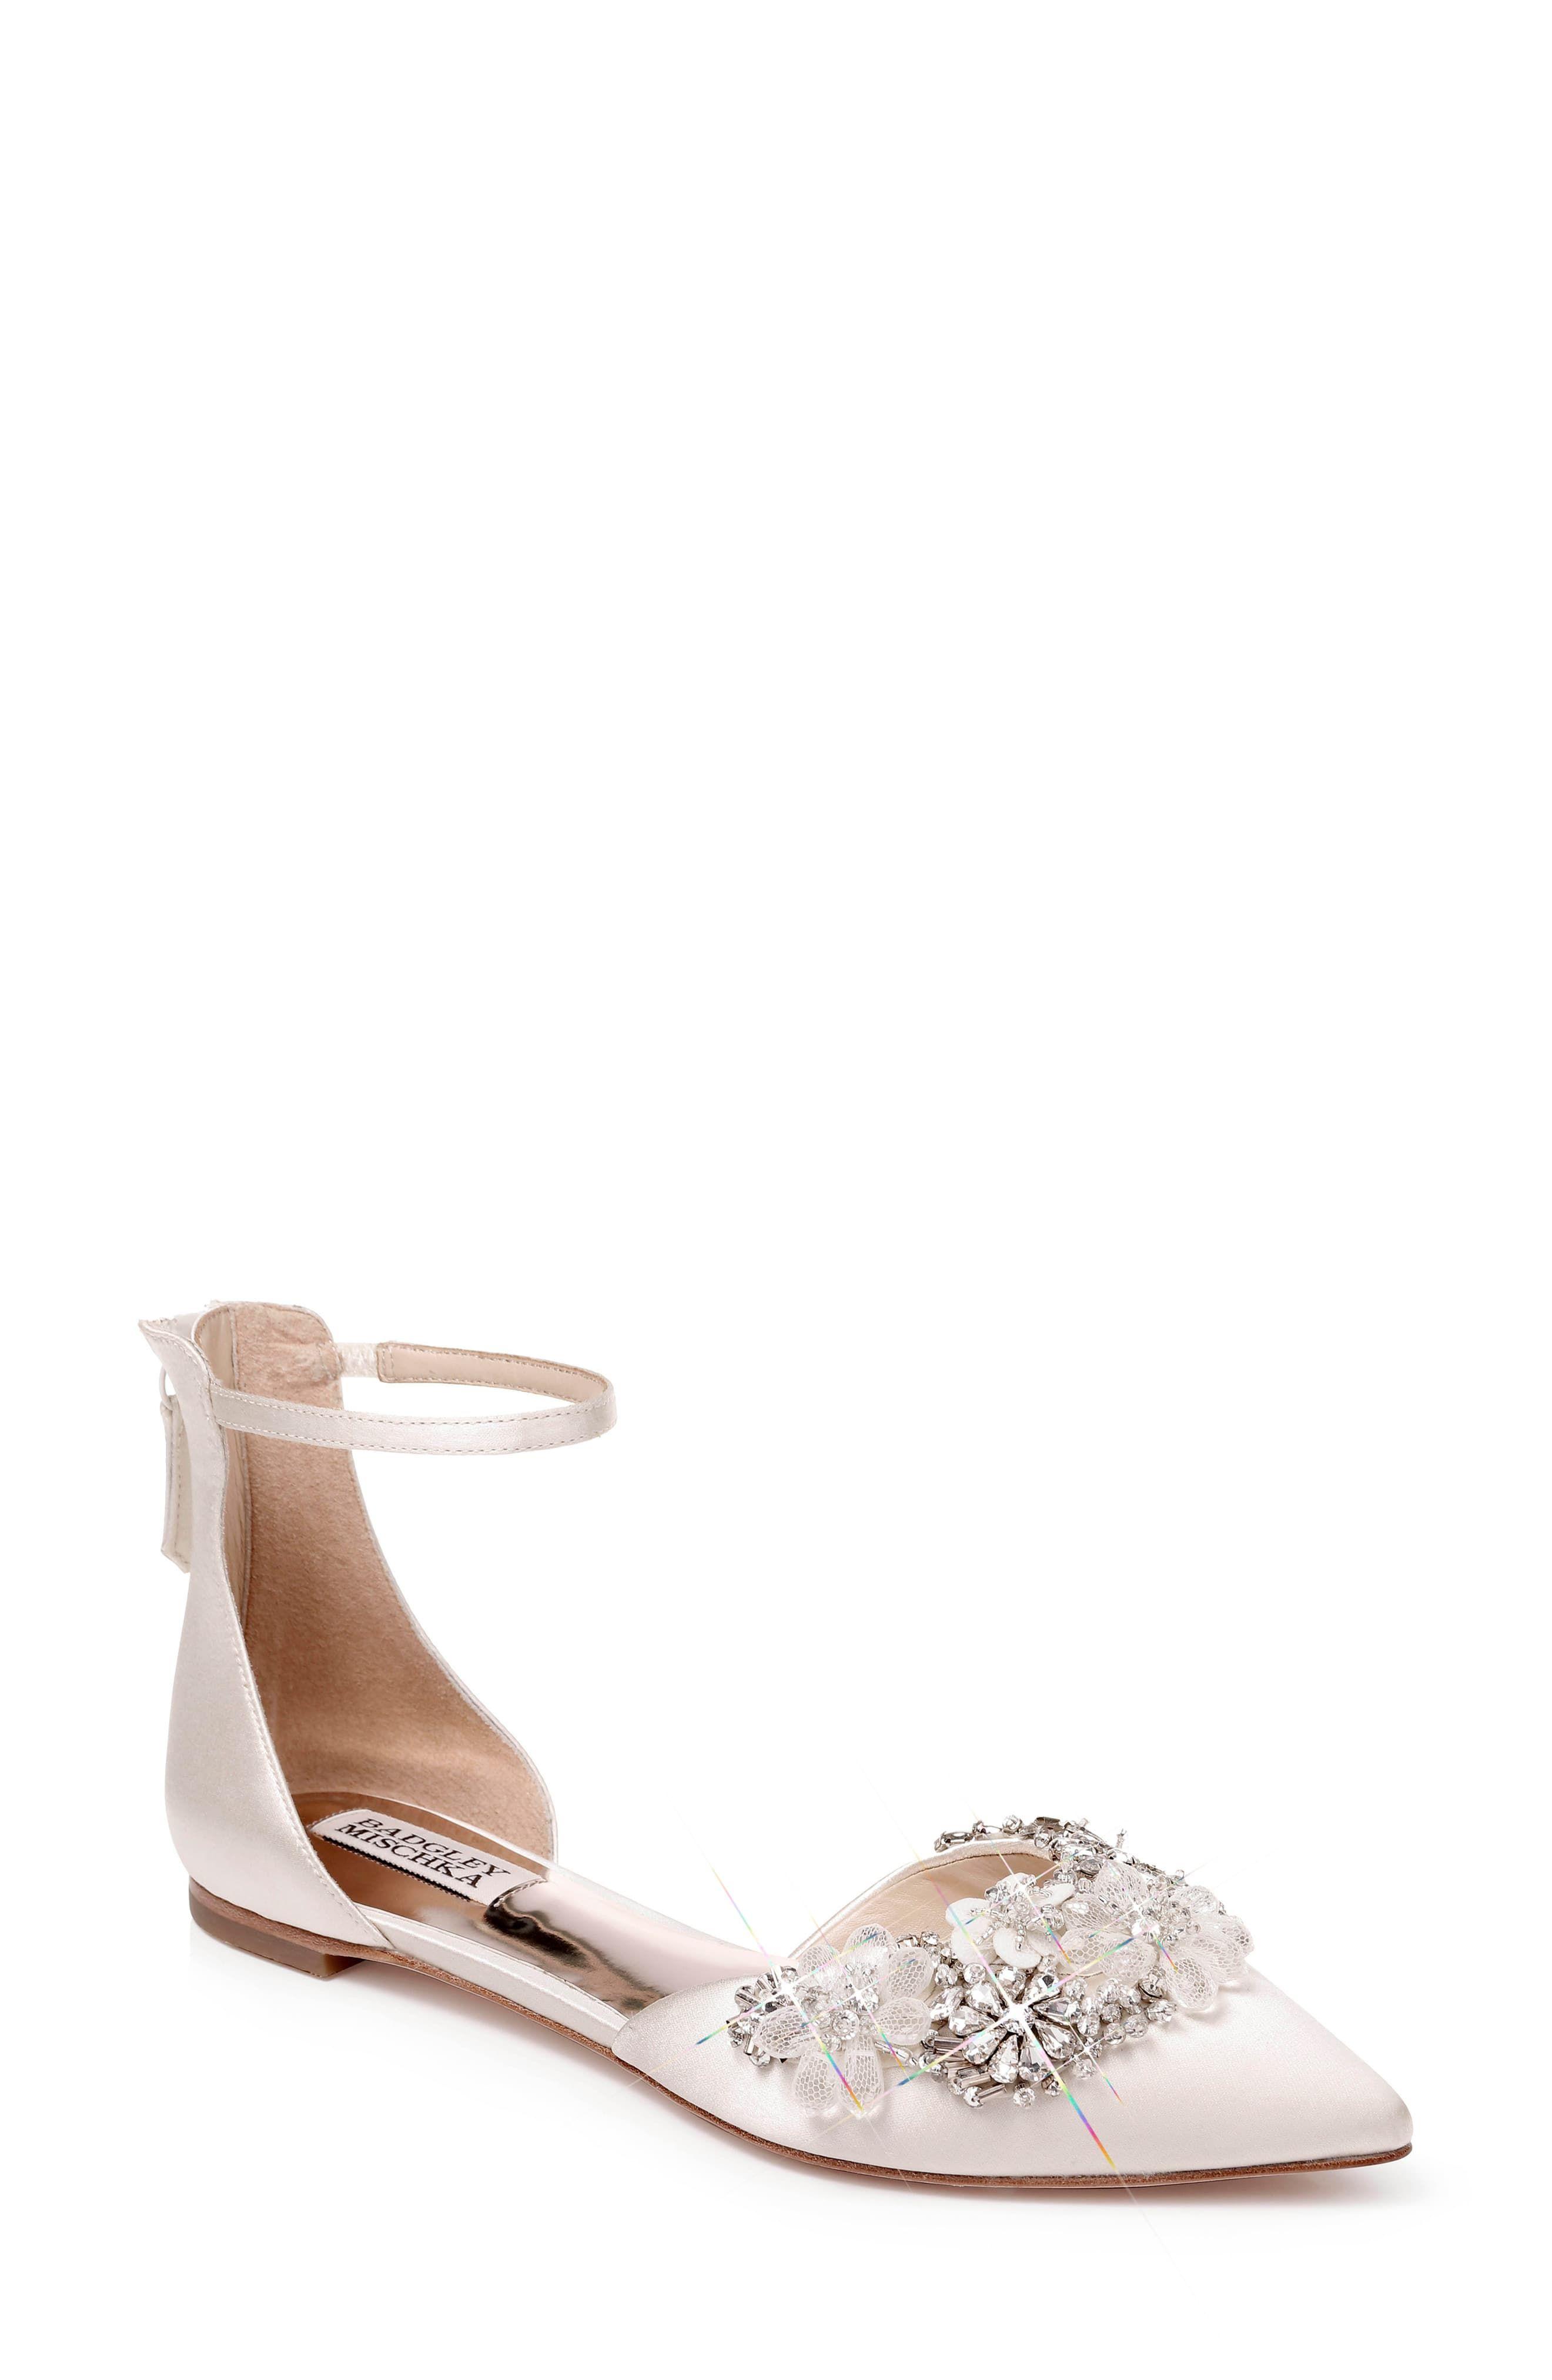 Bridal shoes, Ankle strap flats